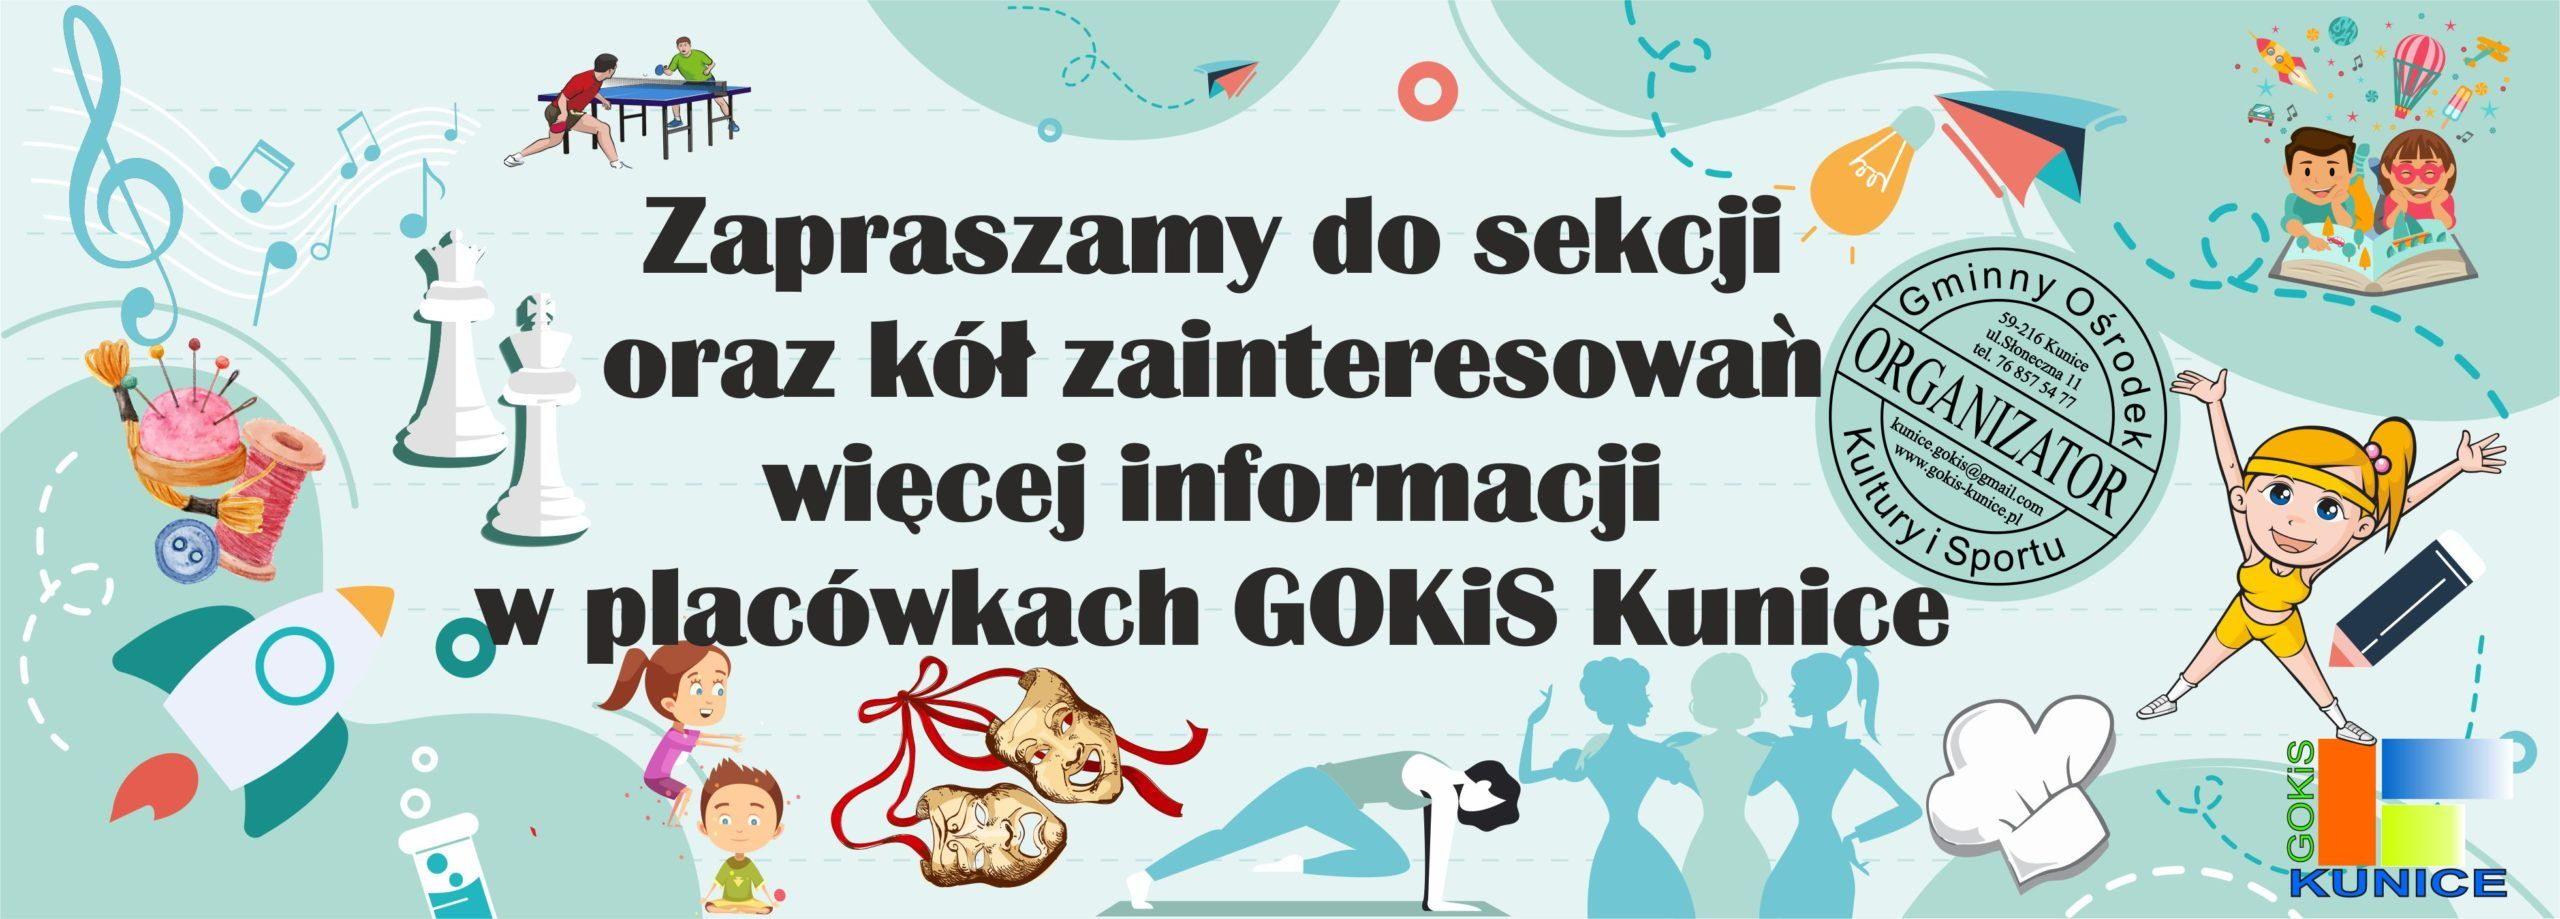 http://www.gokis-kunice.pl/gokis/oferta/